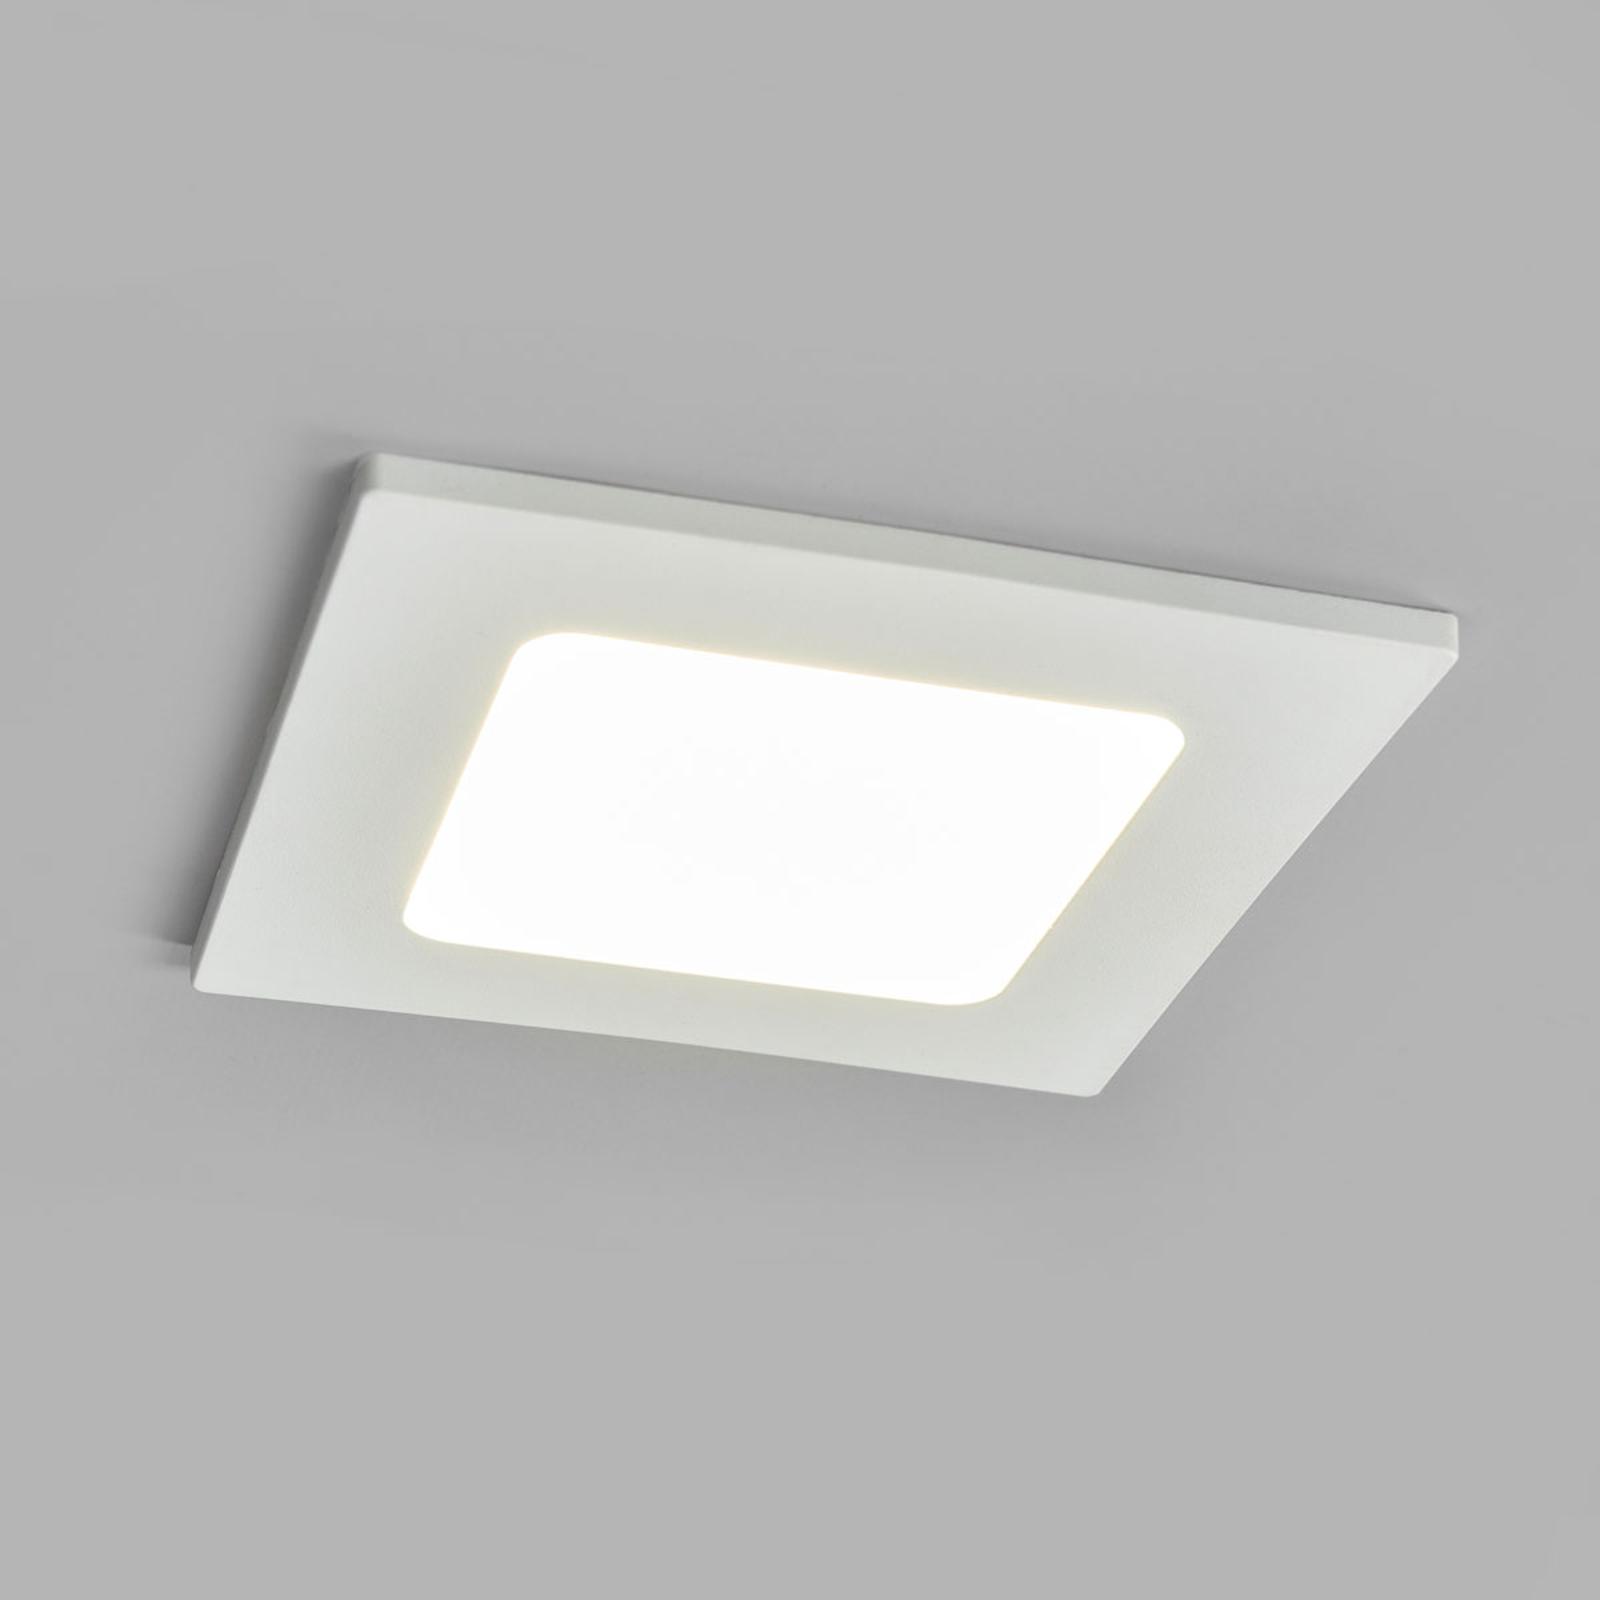 LED-Einbaustrahler Joki weiß 4000K eckig 11,5cm